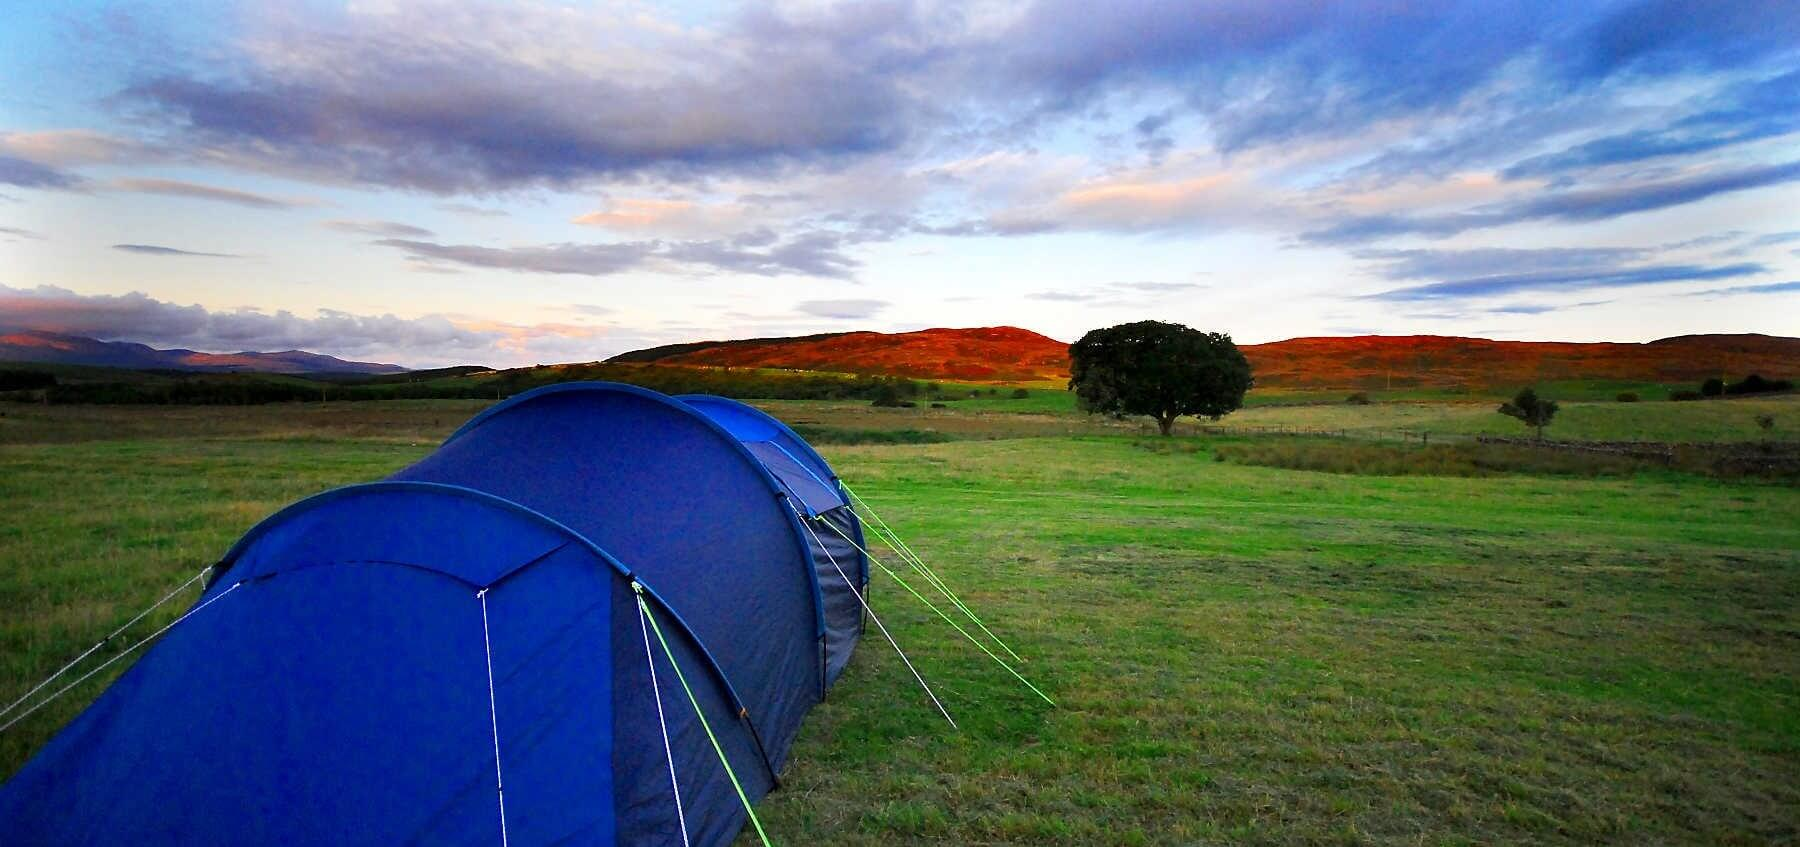 Balloch O Dee Campsite And Trekking Centre